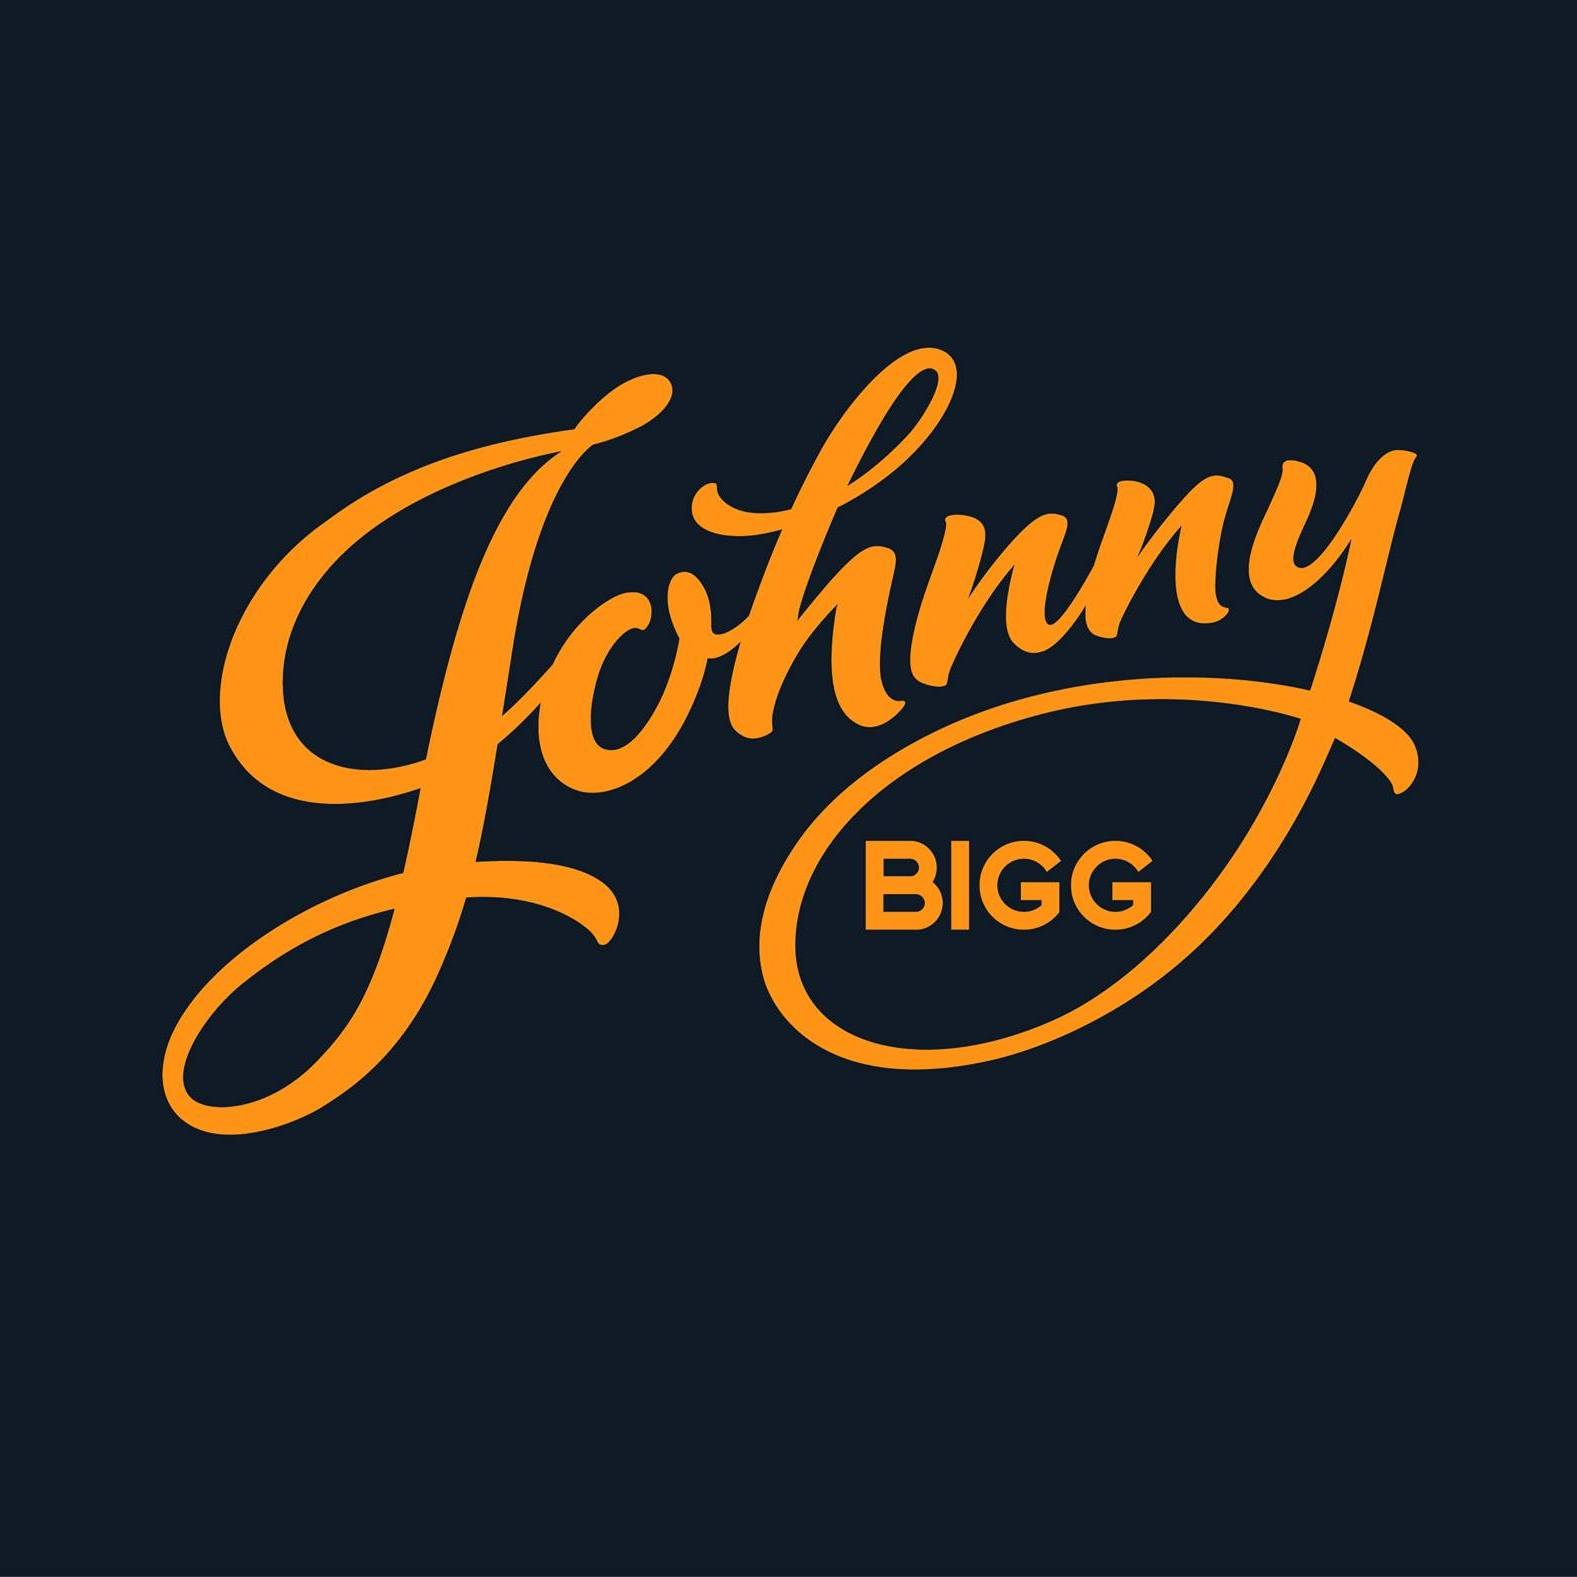 Johnny Bigg AU